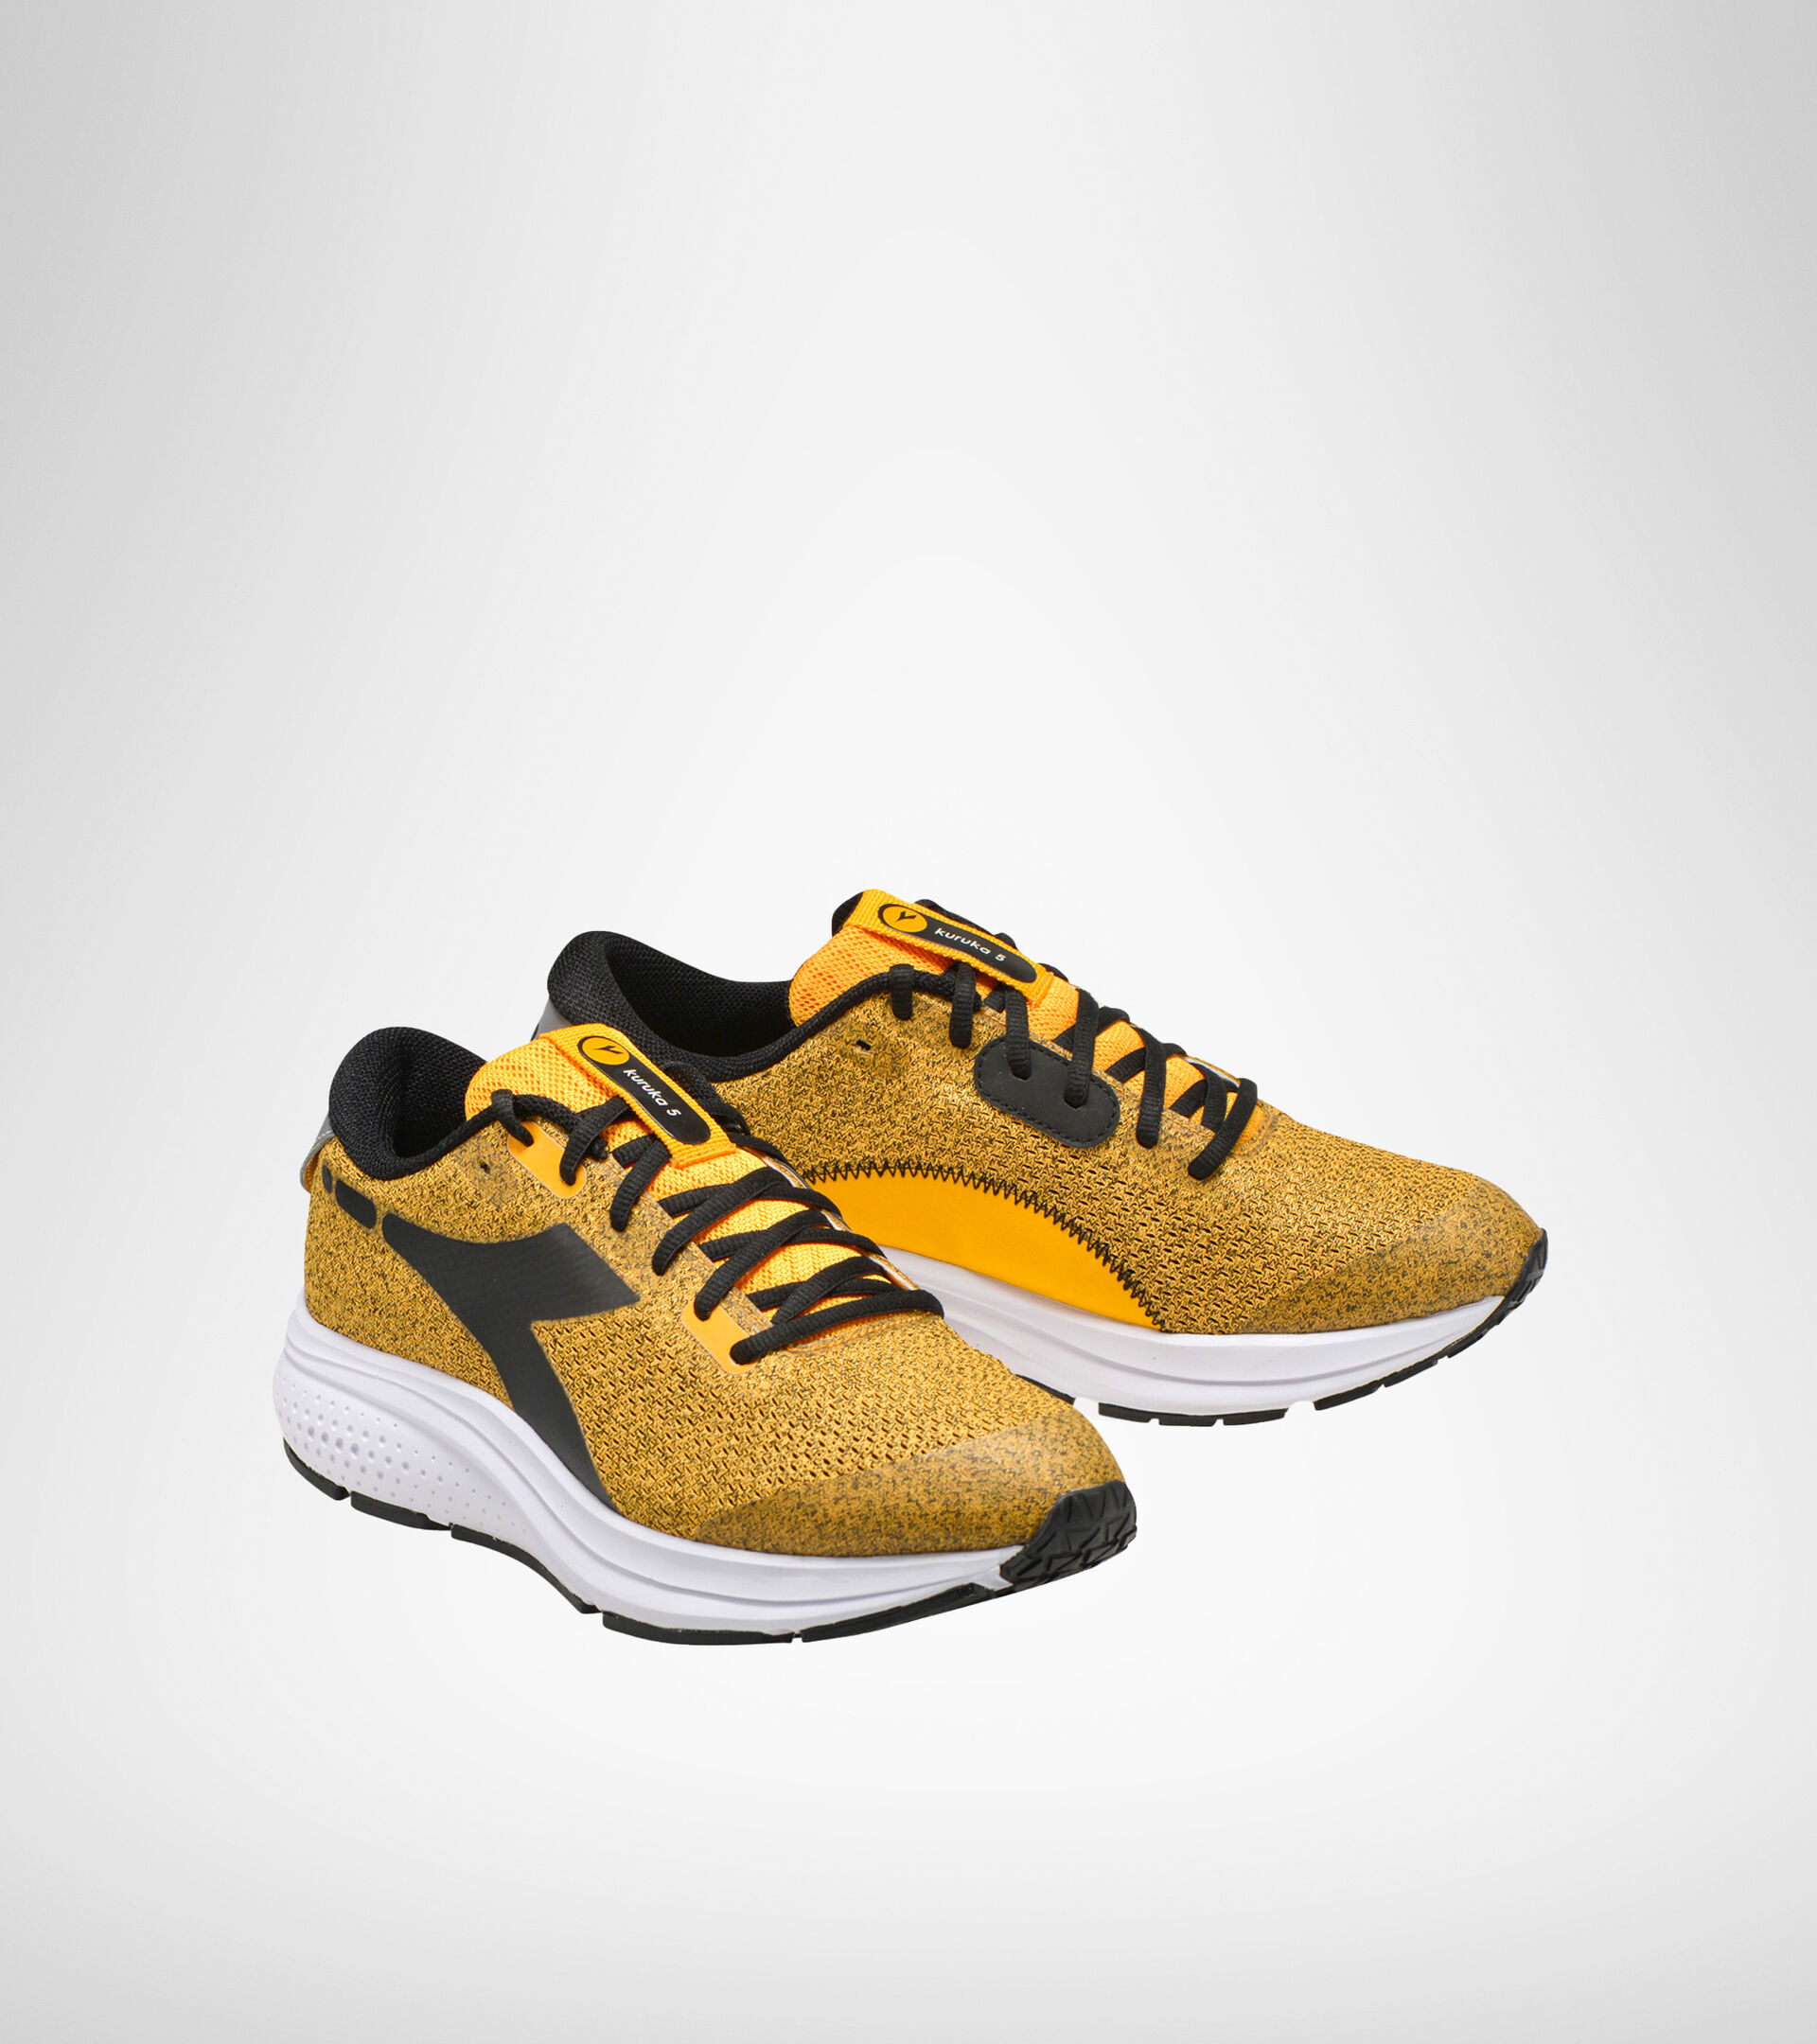 Footwear Sport UOMO KURUKA 5 SAFFRON/BLACK/WHITE Diadora